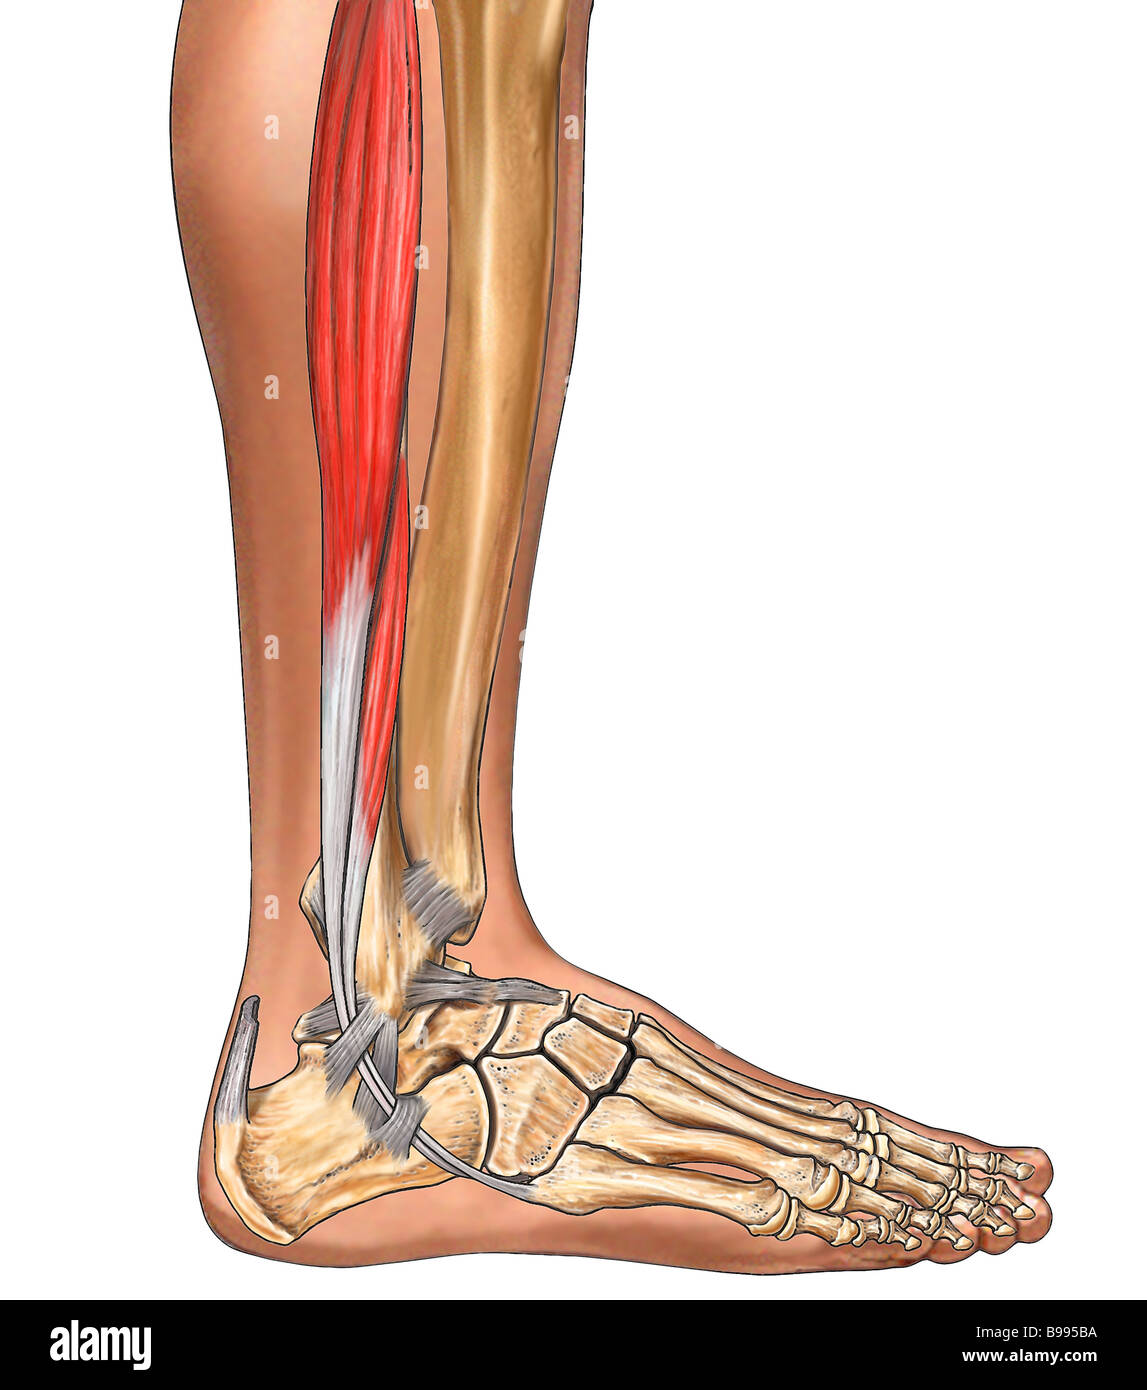 Fibularis Longus, Leg Muscle - Stock Image